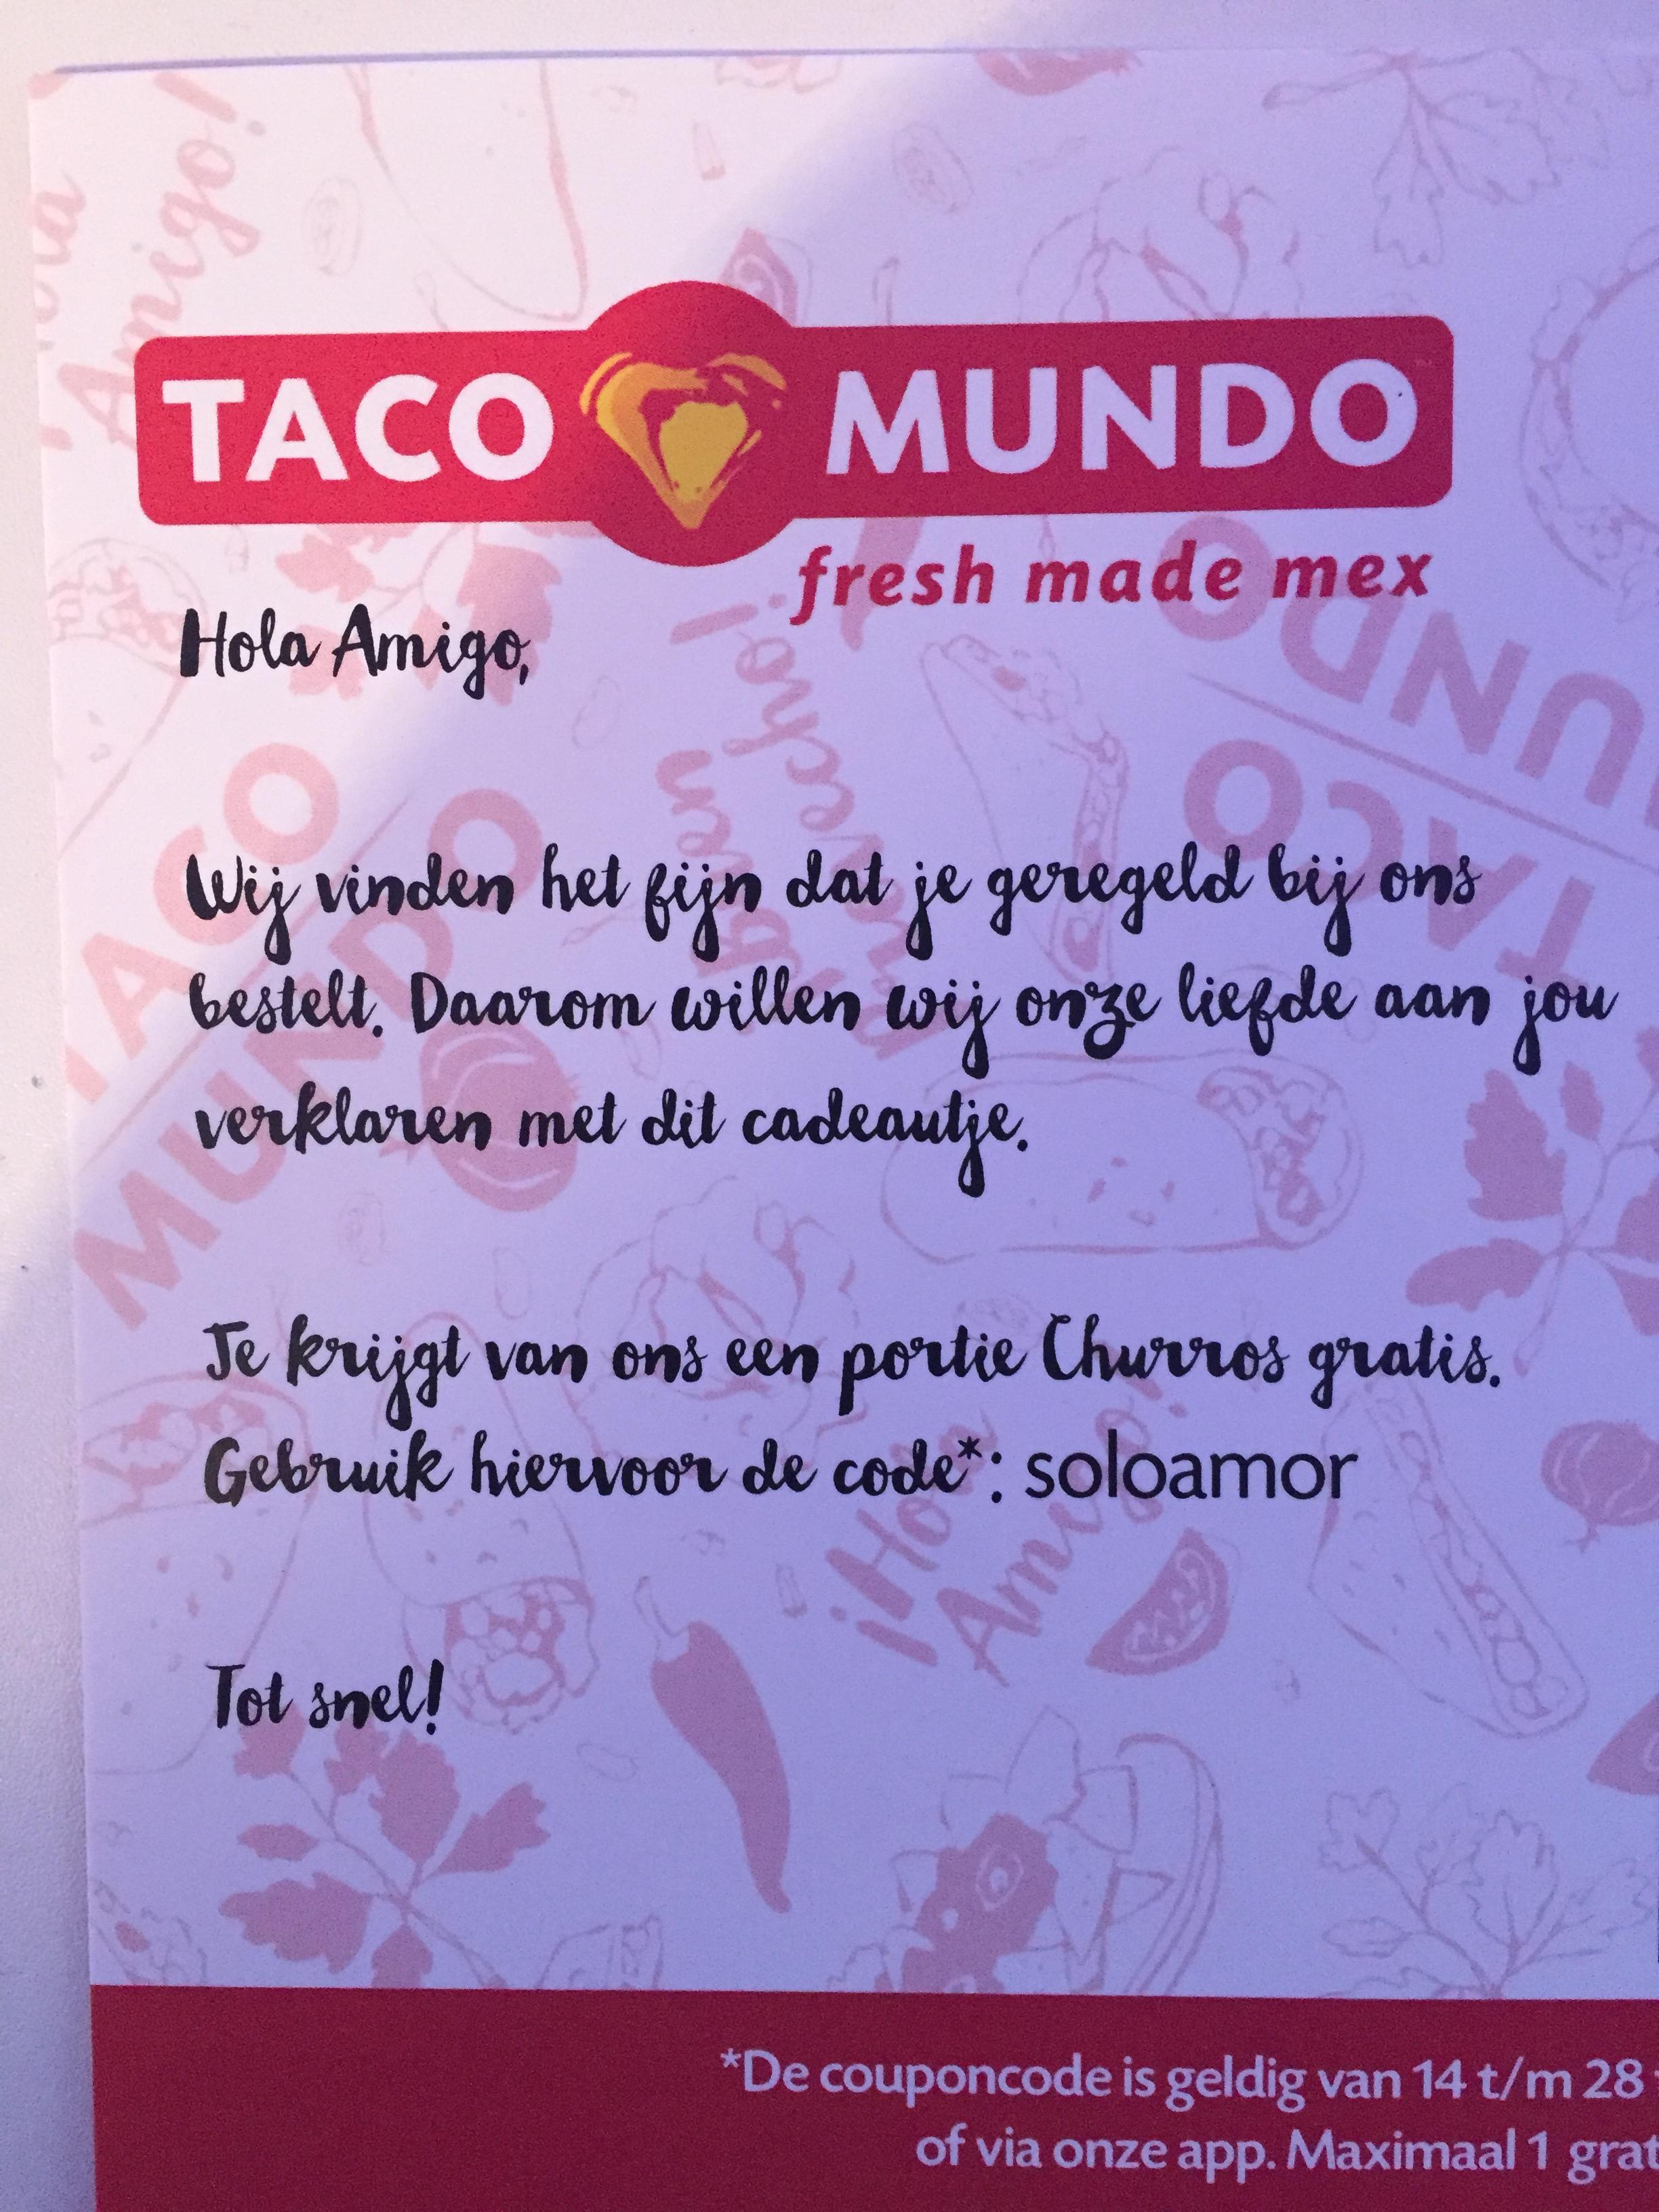 Gratis portie churros bij Taco Mundo